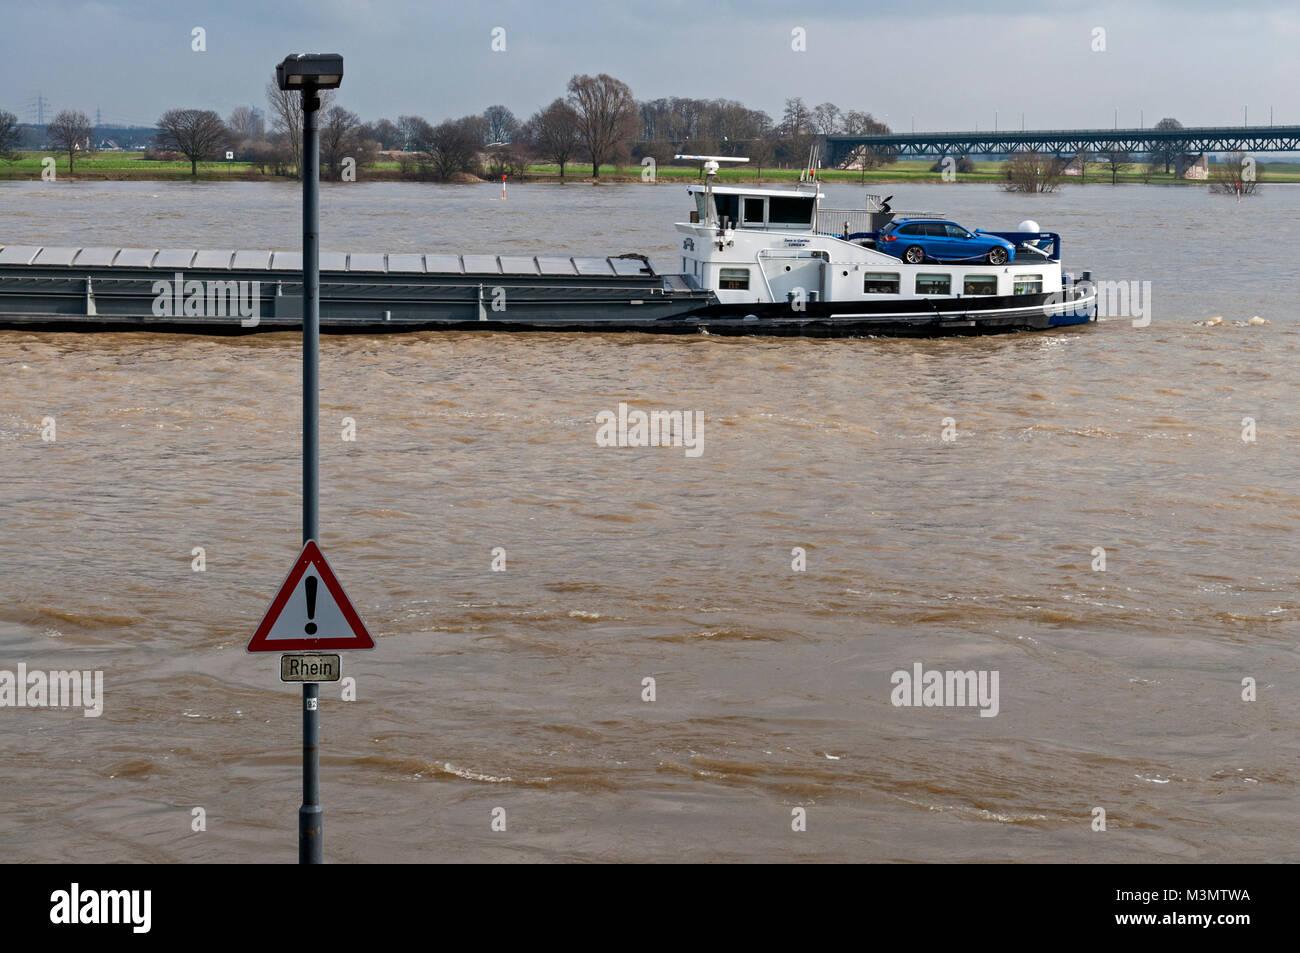 The Rhine at Krefeld-Uerdingen, NRW, Germany. - Stock Image